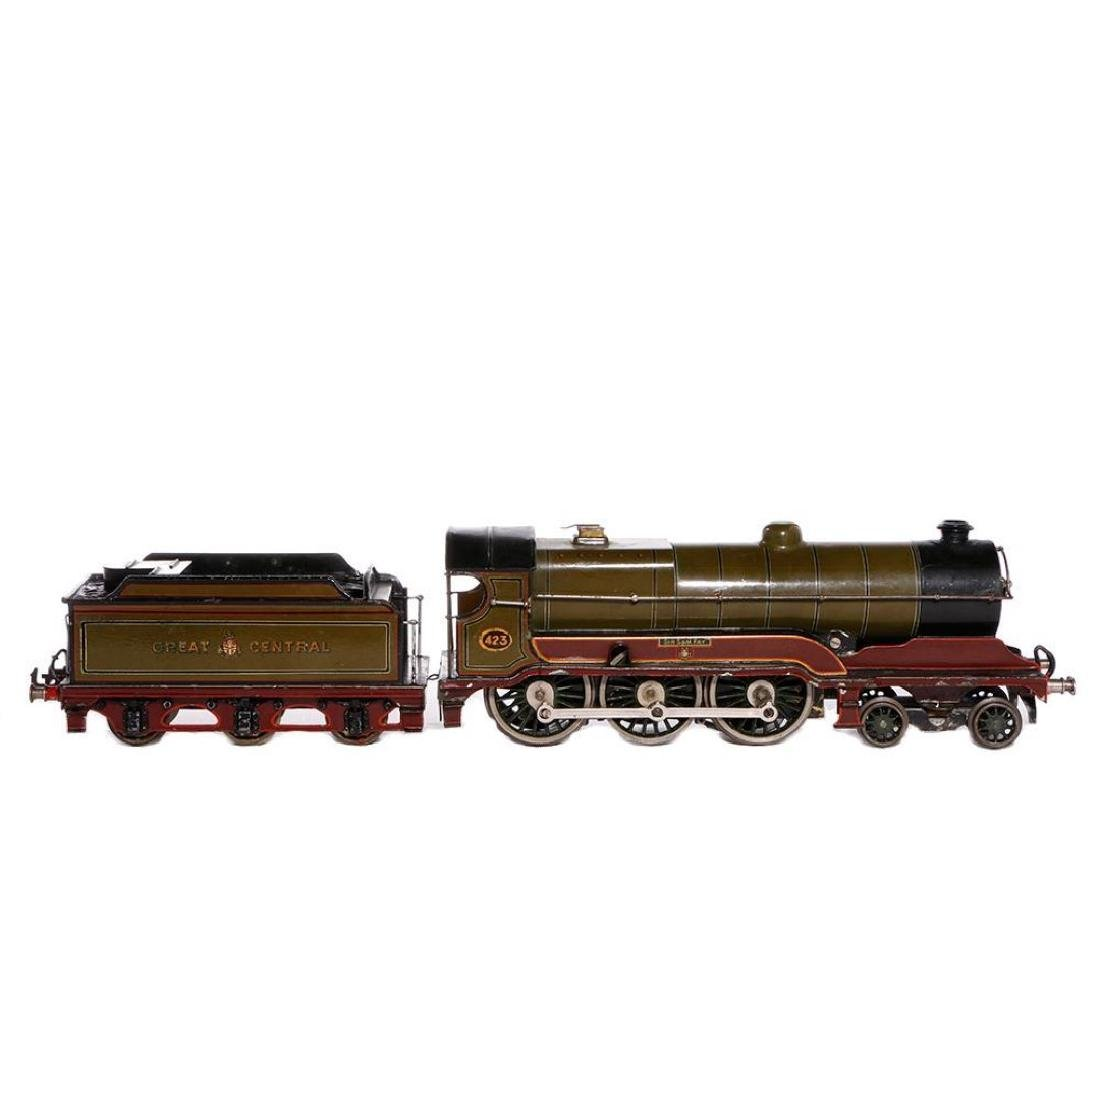 Bing #1 Gauge English Style 4-6-0 Steam Locomotive